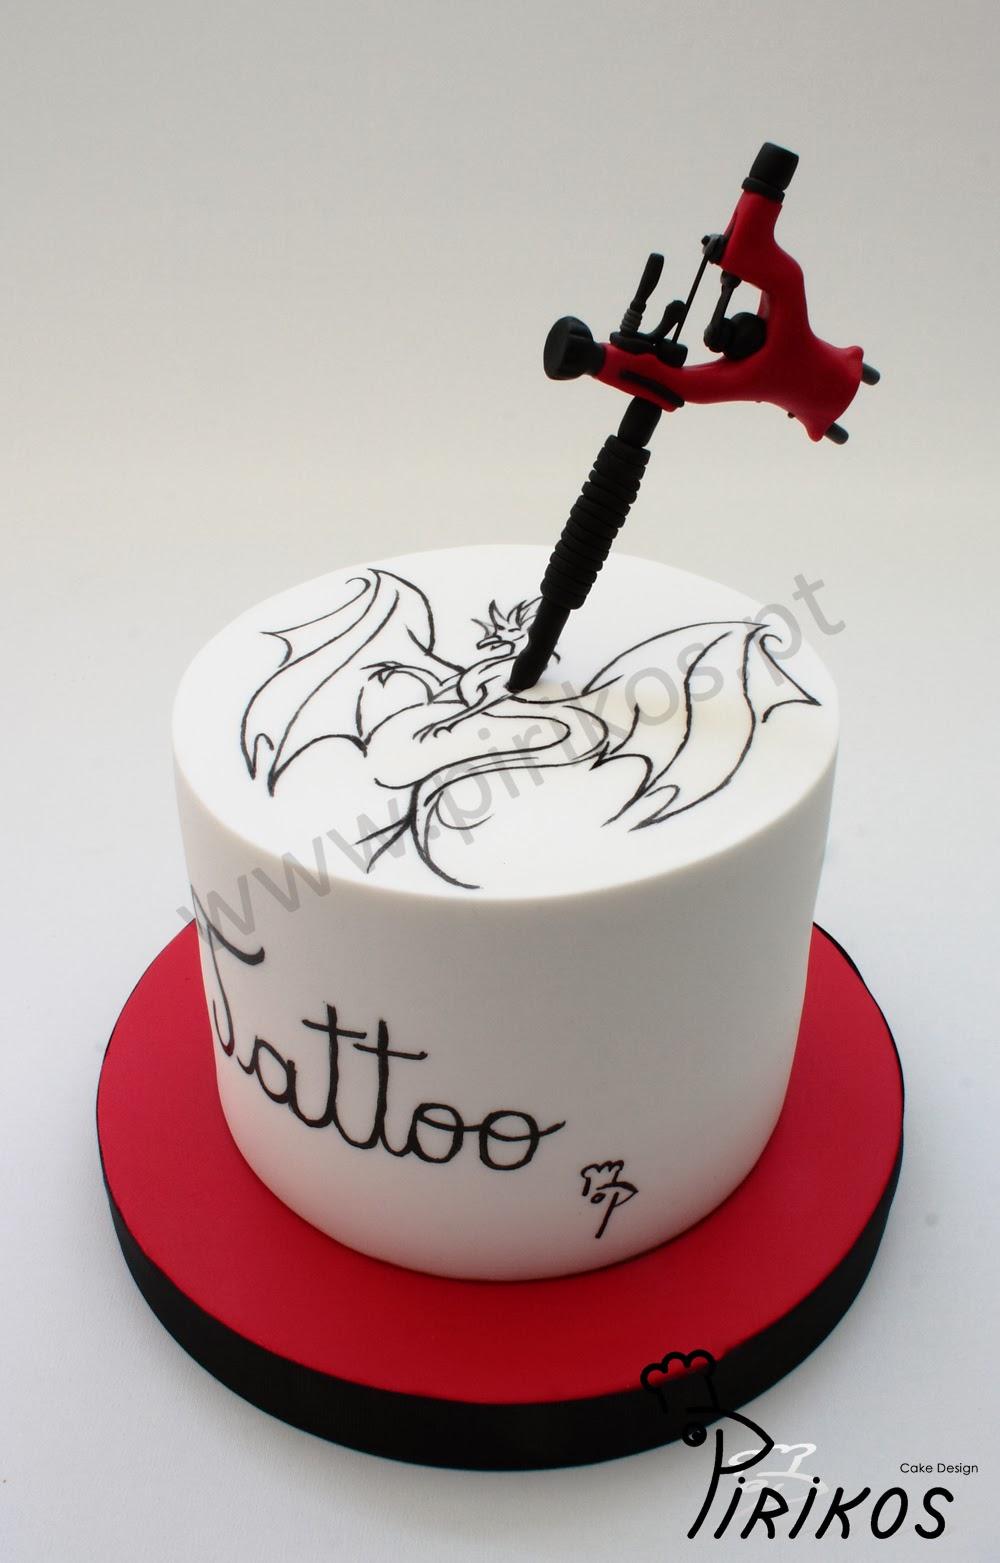 Pirikos Cake Design Bolo Tatto